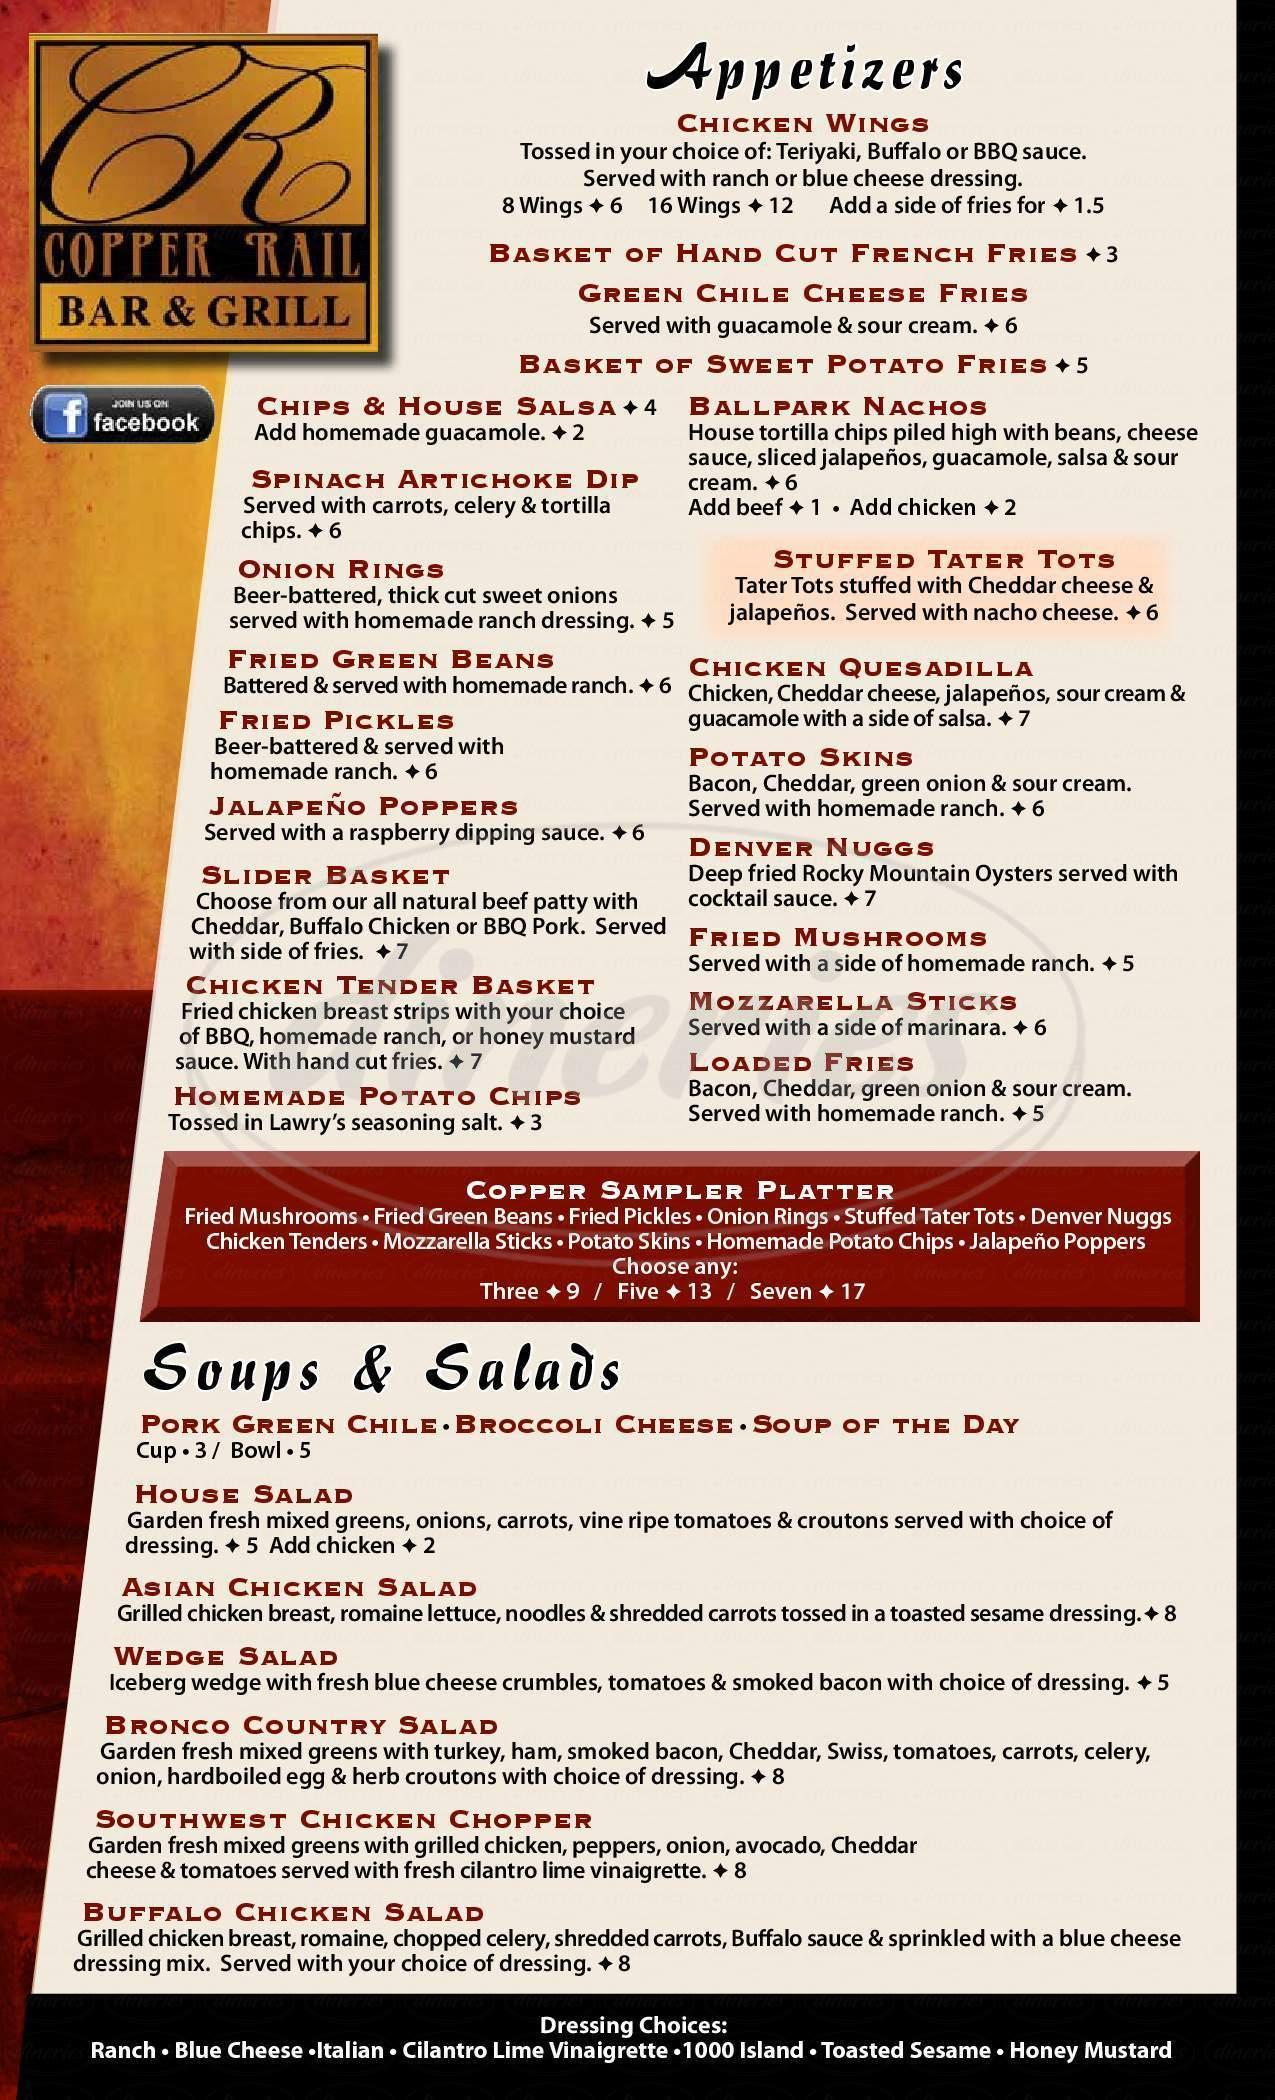 menu for Copper Rail Bar & Grill